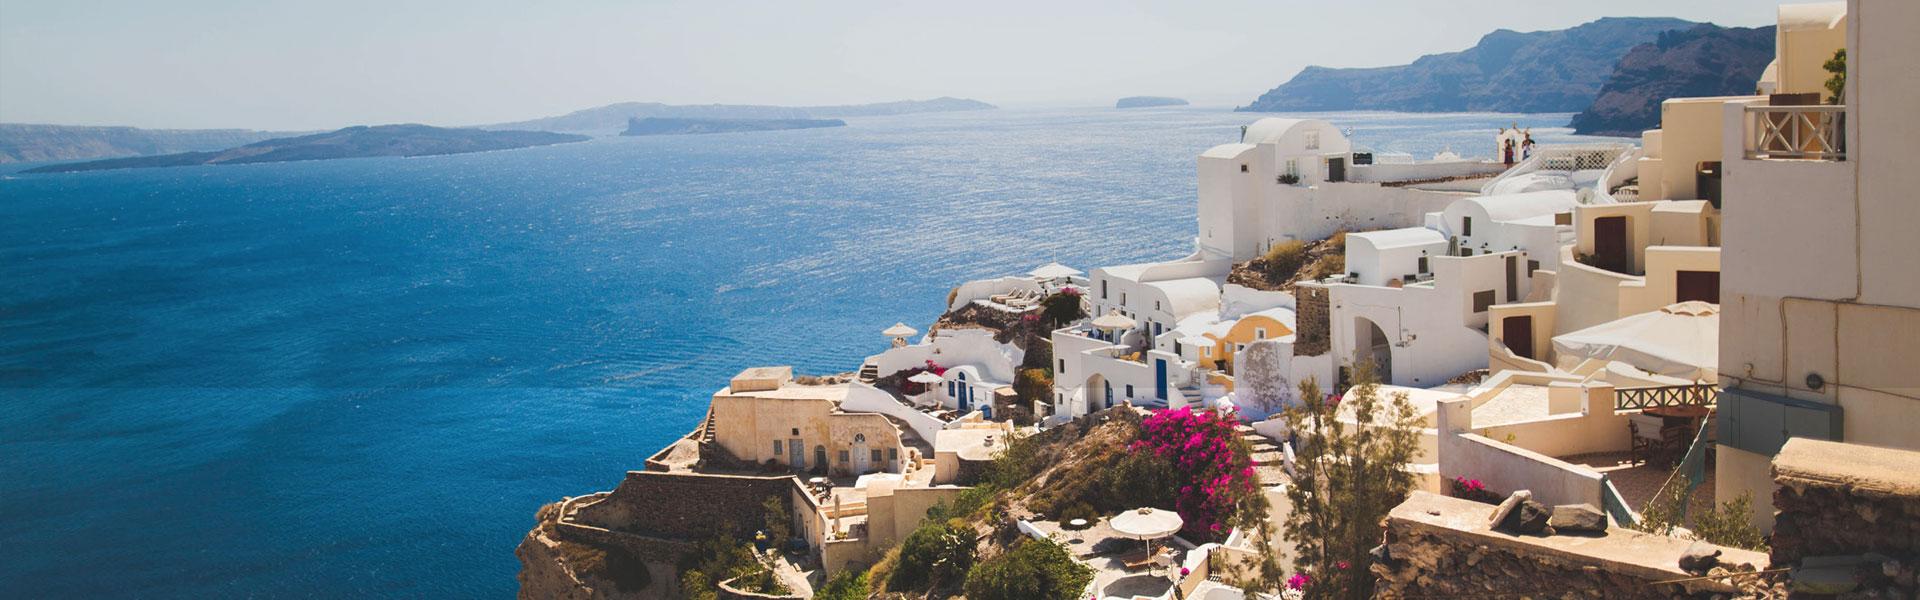 Mediterranean Discovery with Italian Lakes & Villas